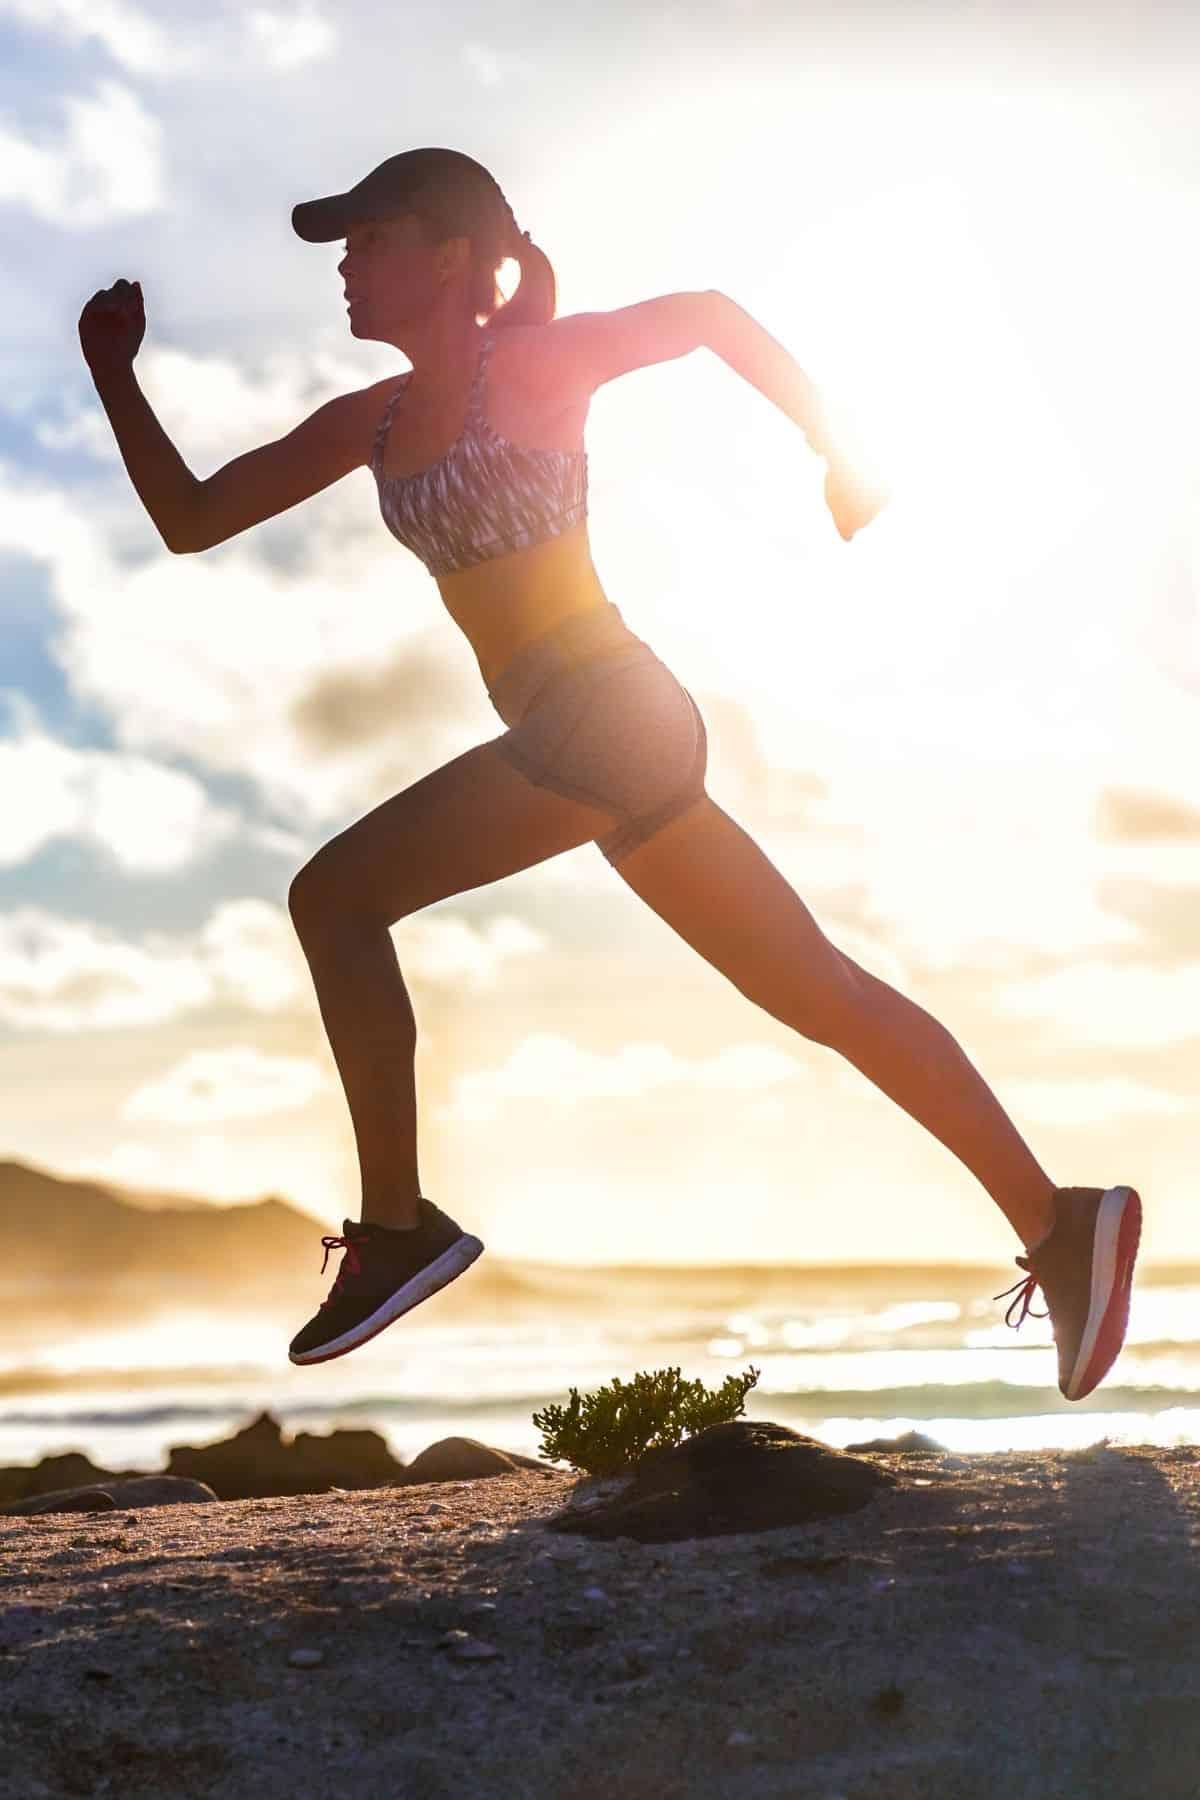 female athlete sprinting on a beach